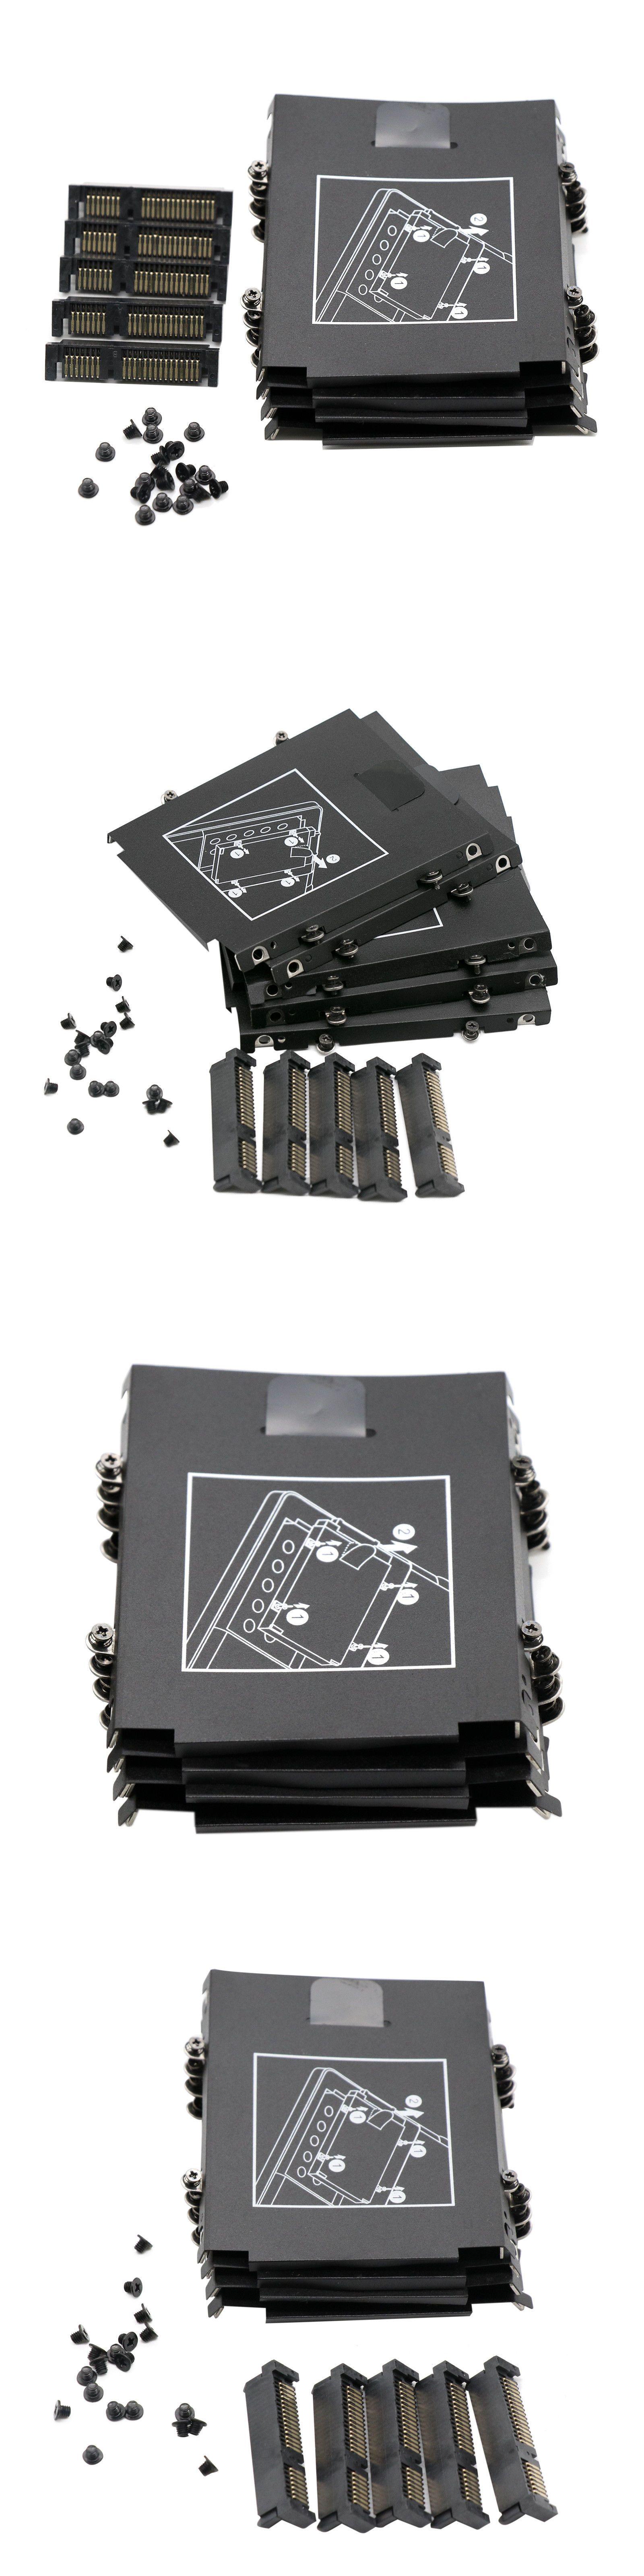 5pcs New  For HP EliteBook 9470M 9480M SATA Hard Drive Caddy Connector